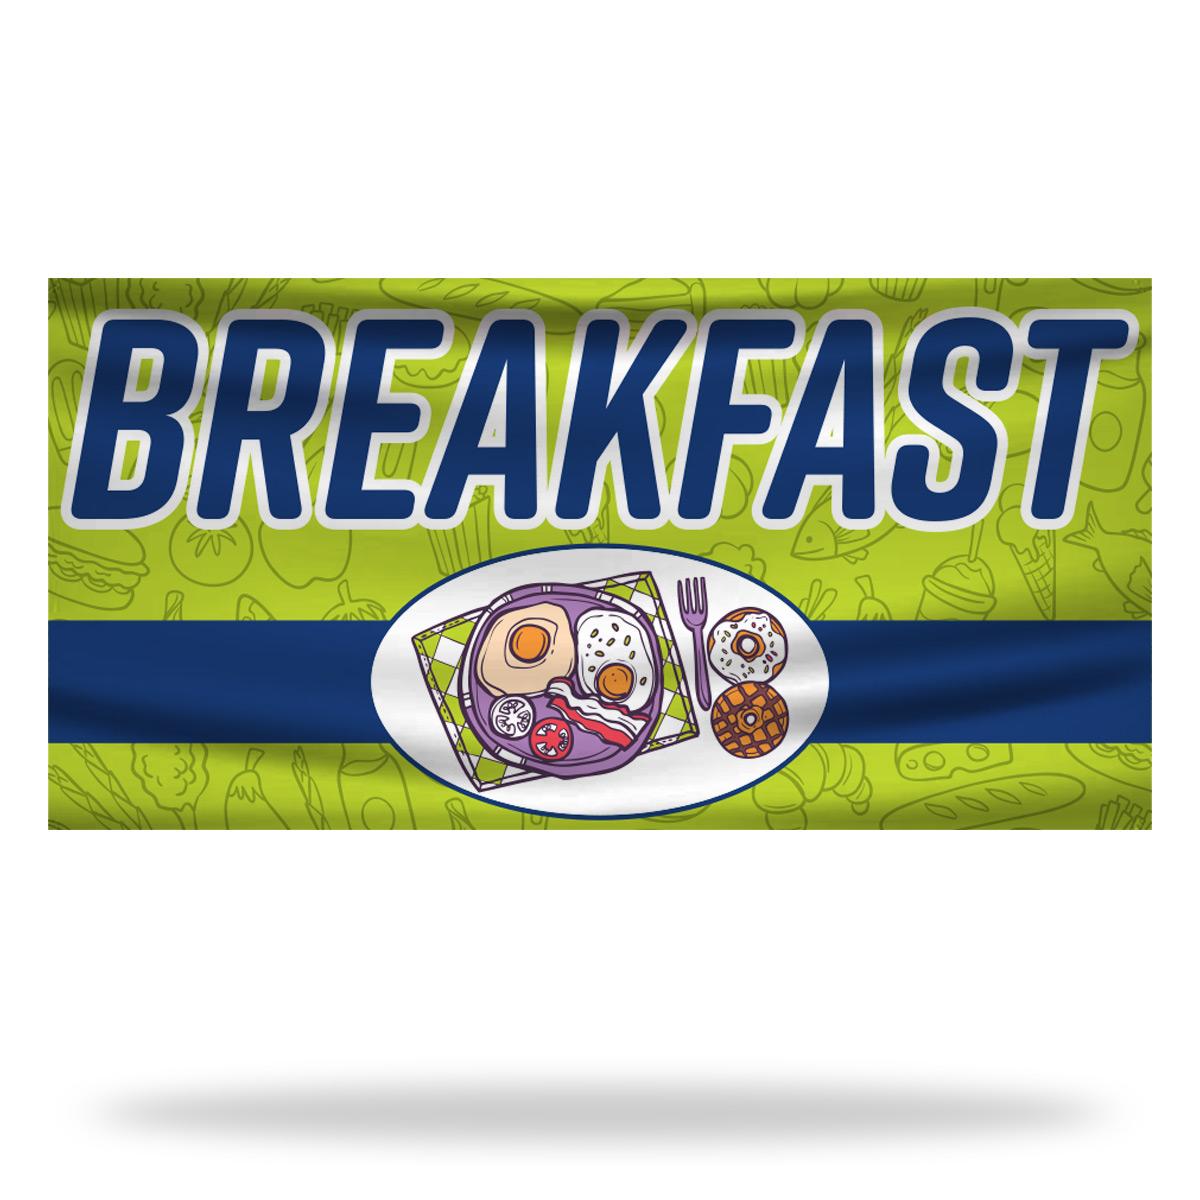 Breakfast Flags & Banners Design 03